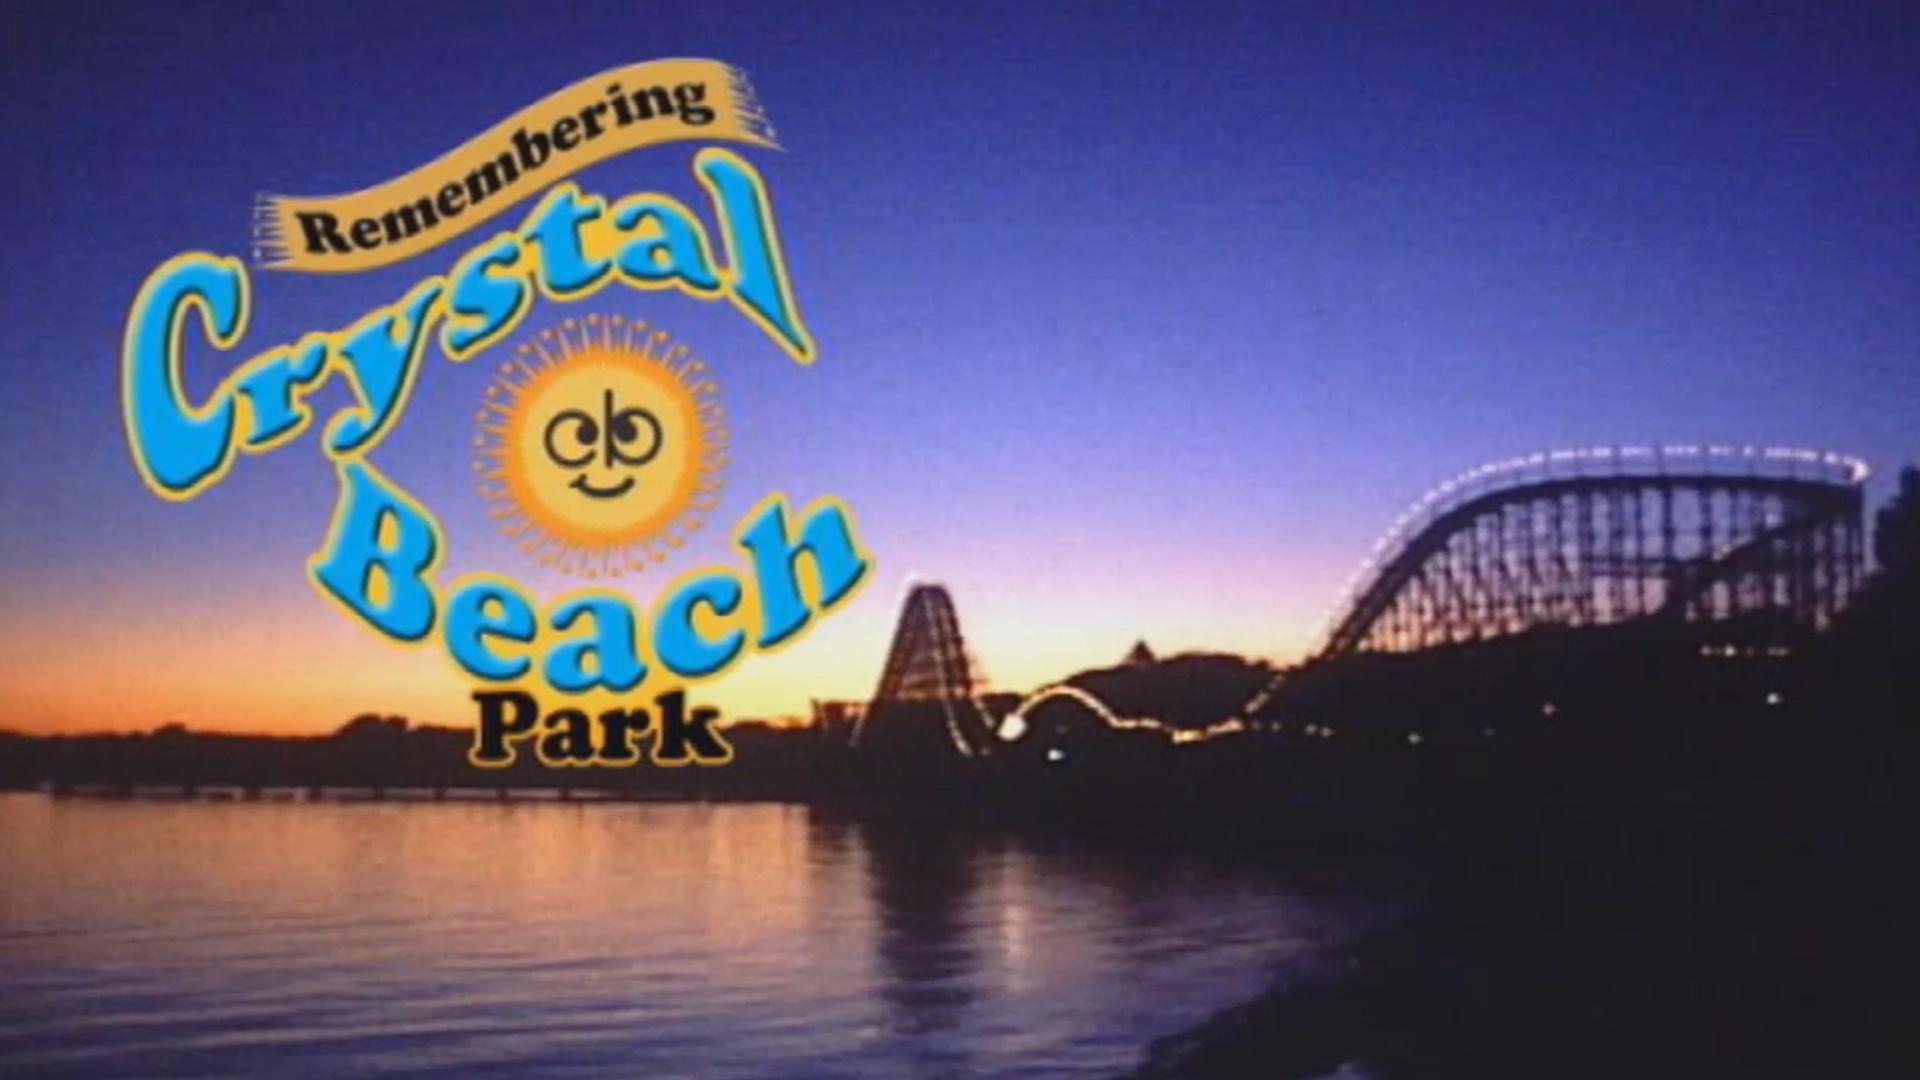 Remembering Crystal Beach Park